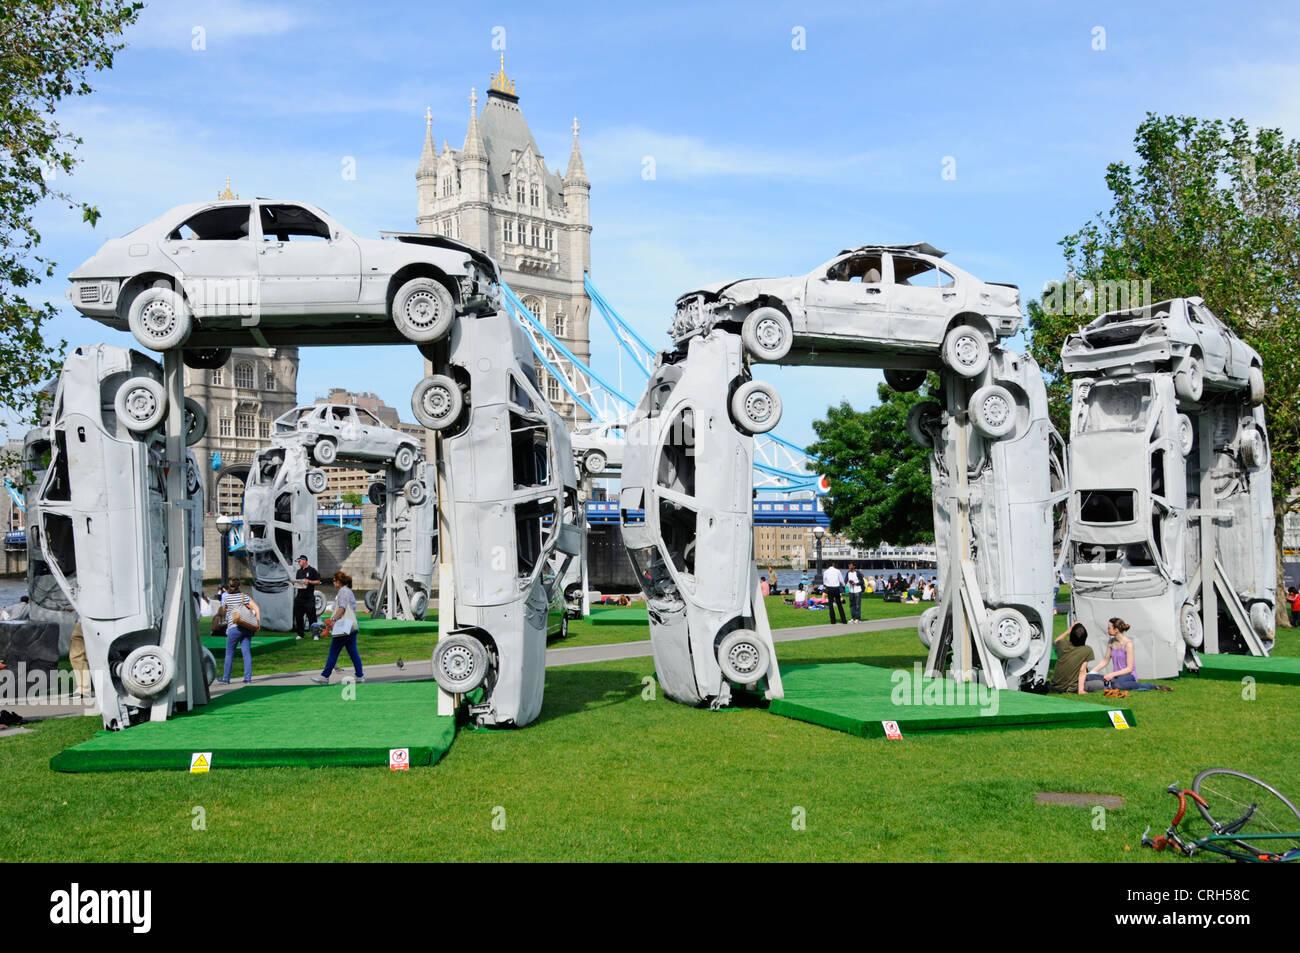 CitiHenge 2012 replica sculpture of Stonehenge, project undertaken by Skoda and built using 18 scrap cars - Stock Image